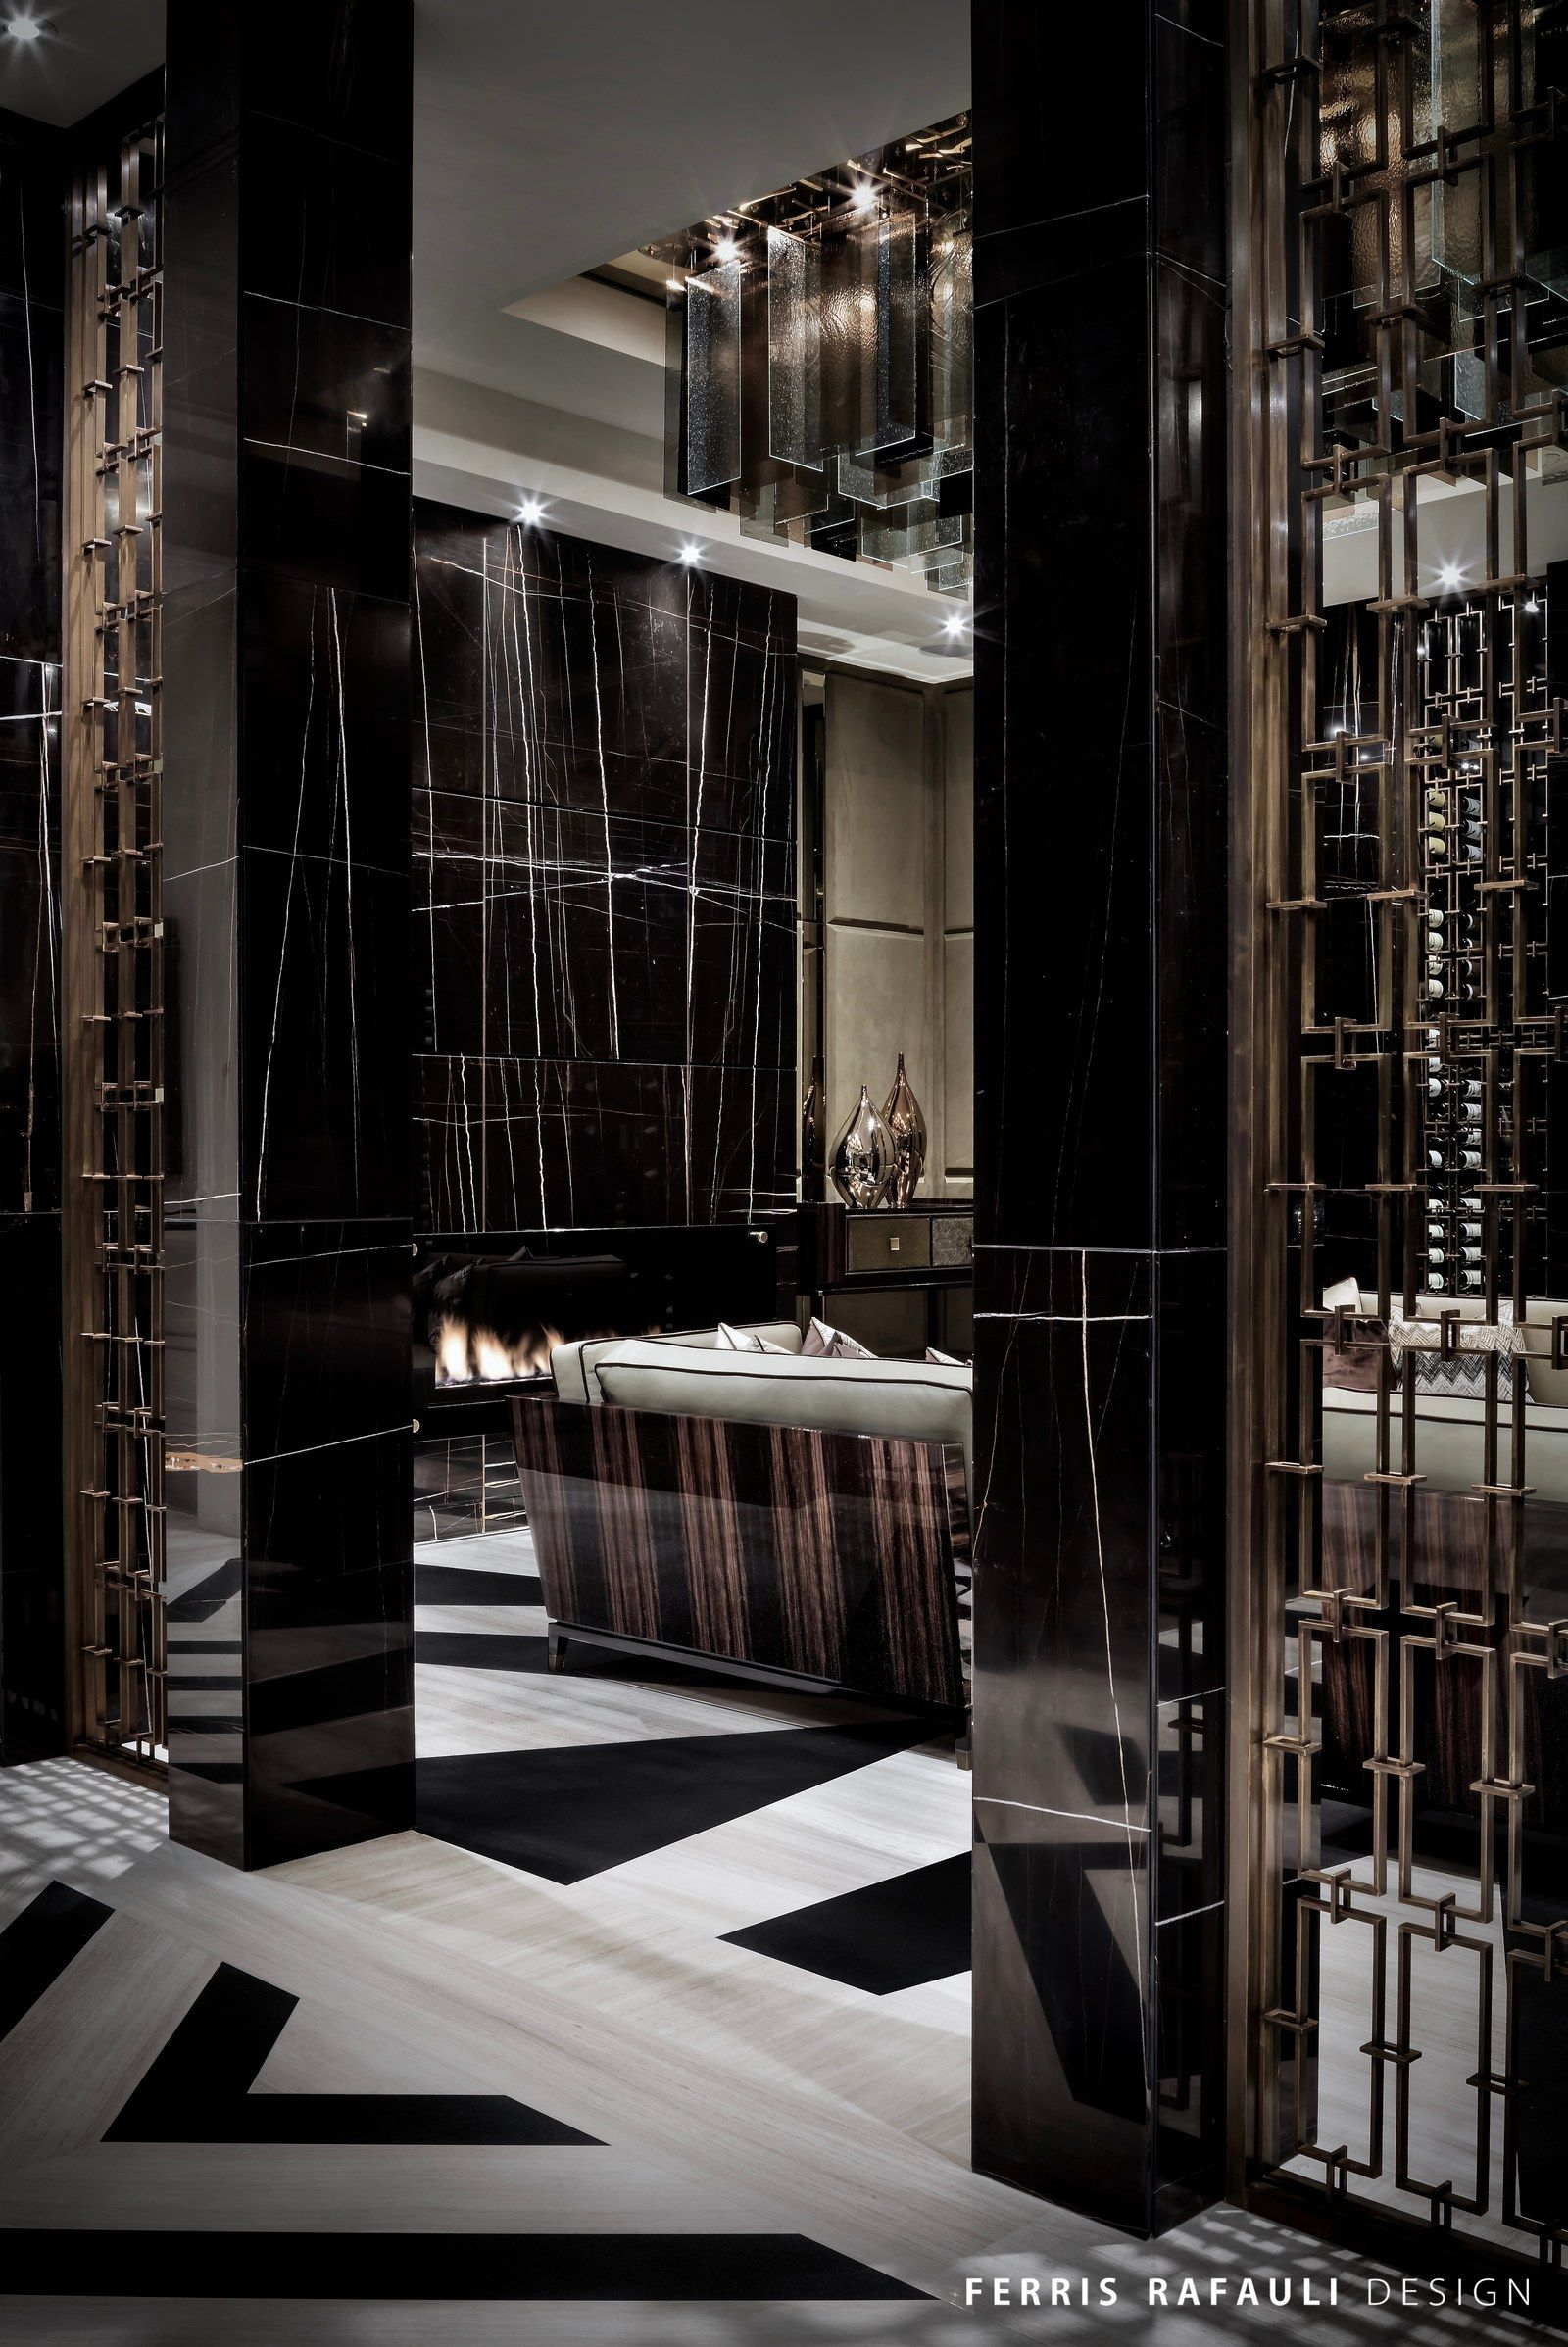 Architecture by Ferris Rafauli  Luxury  Home interior